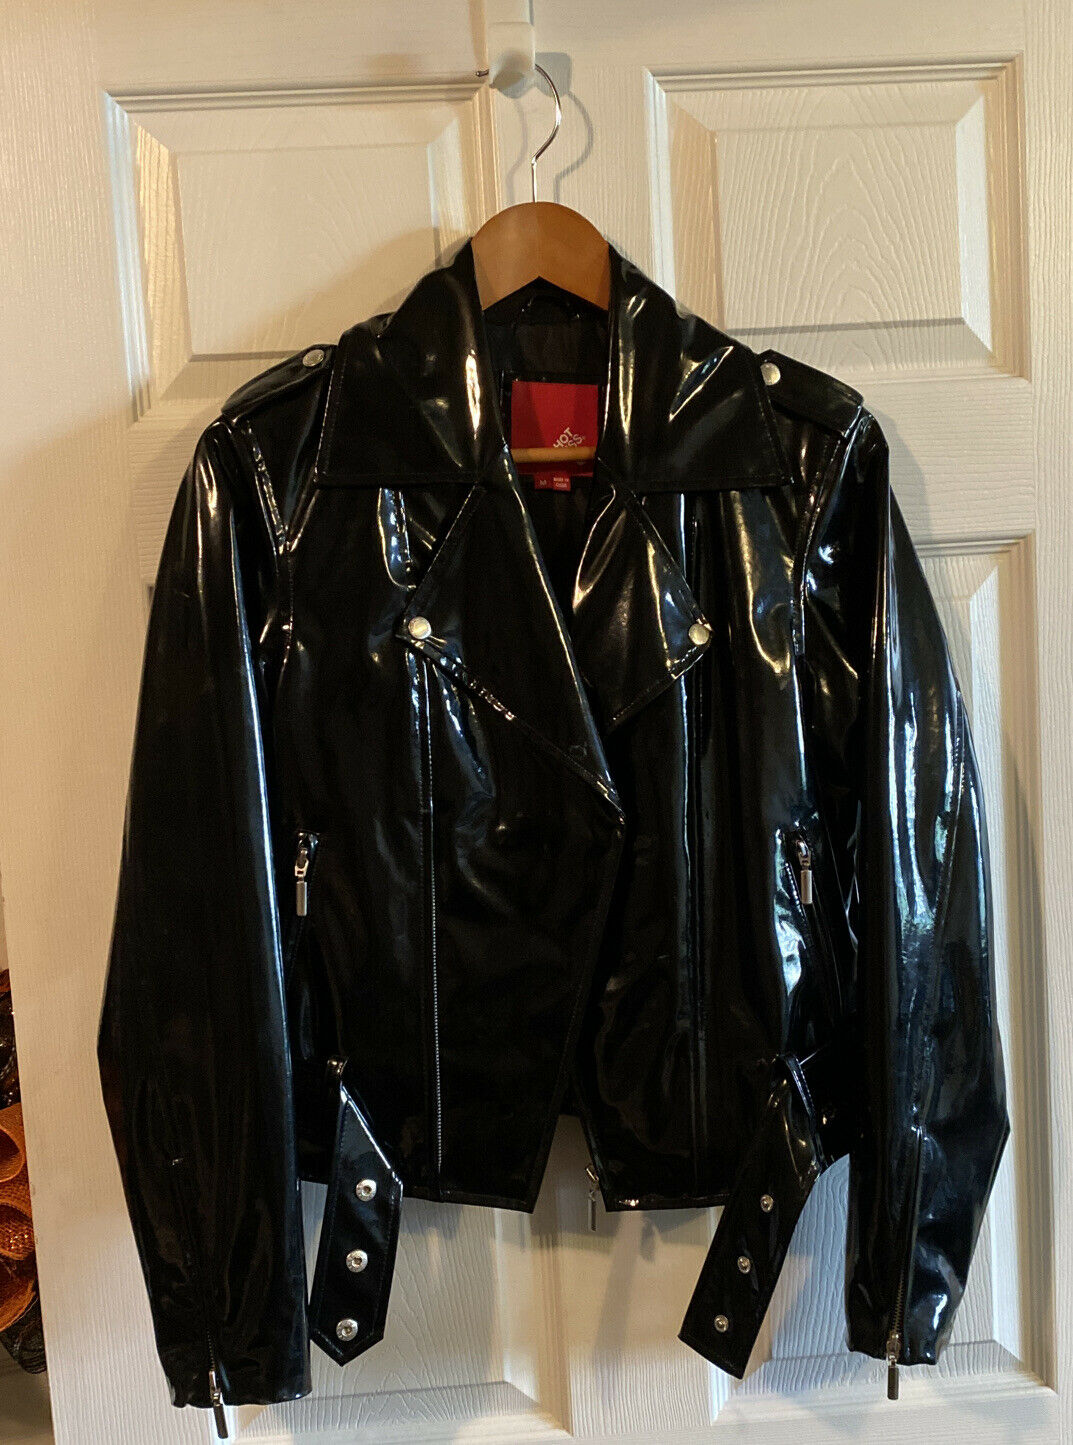 Cosplay Collar Faux Leather Jacket Halloween Costume Black Shiny Club wear Goth